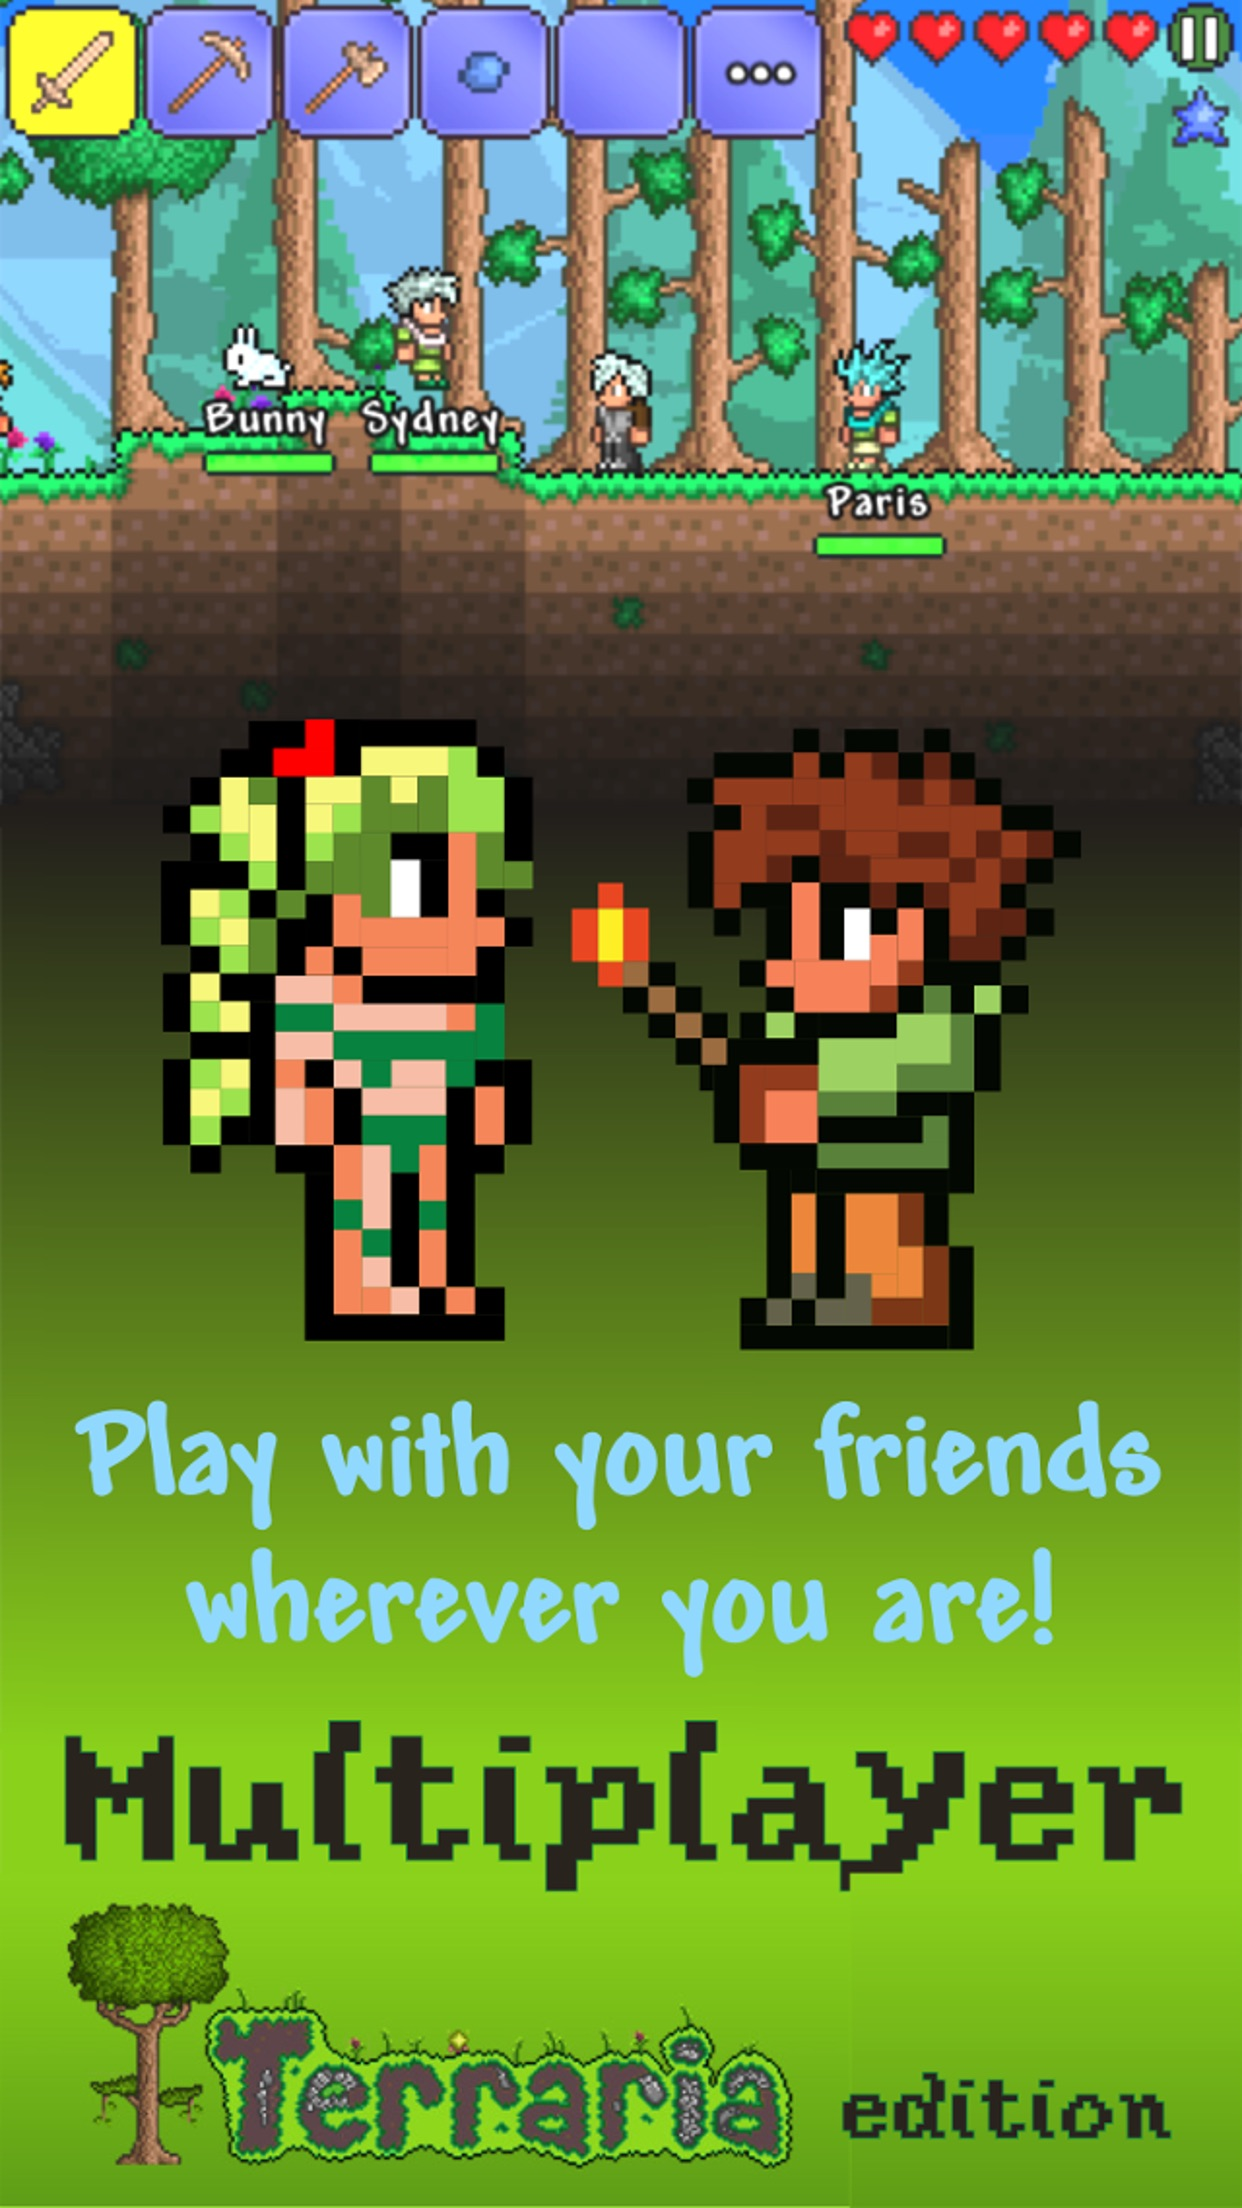 Multiplayer Terraria edition Screenshot